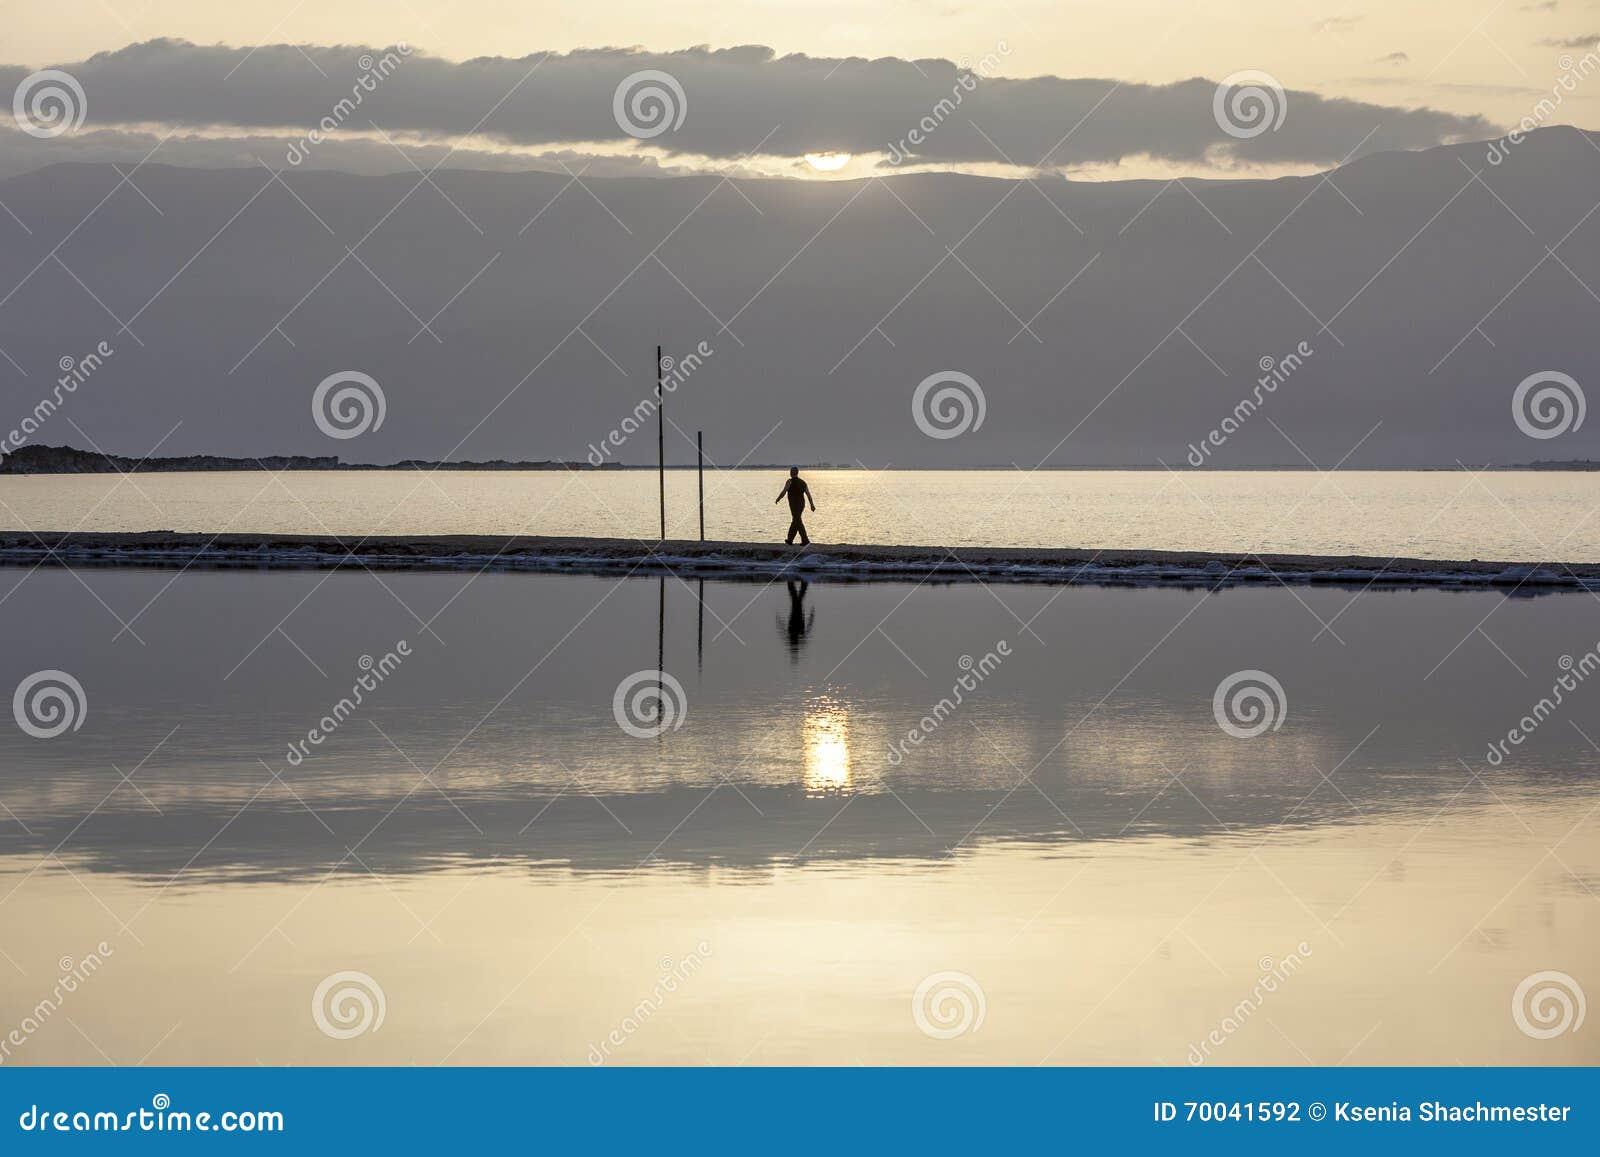 Man walking on headland at early morning under rising sun